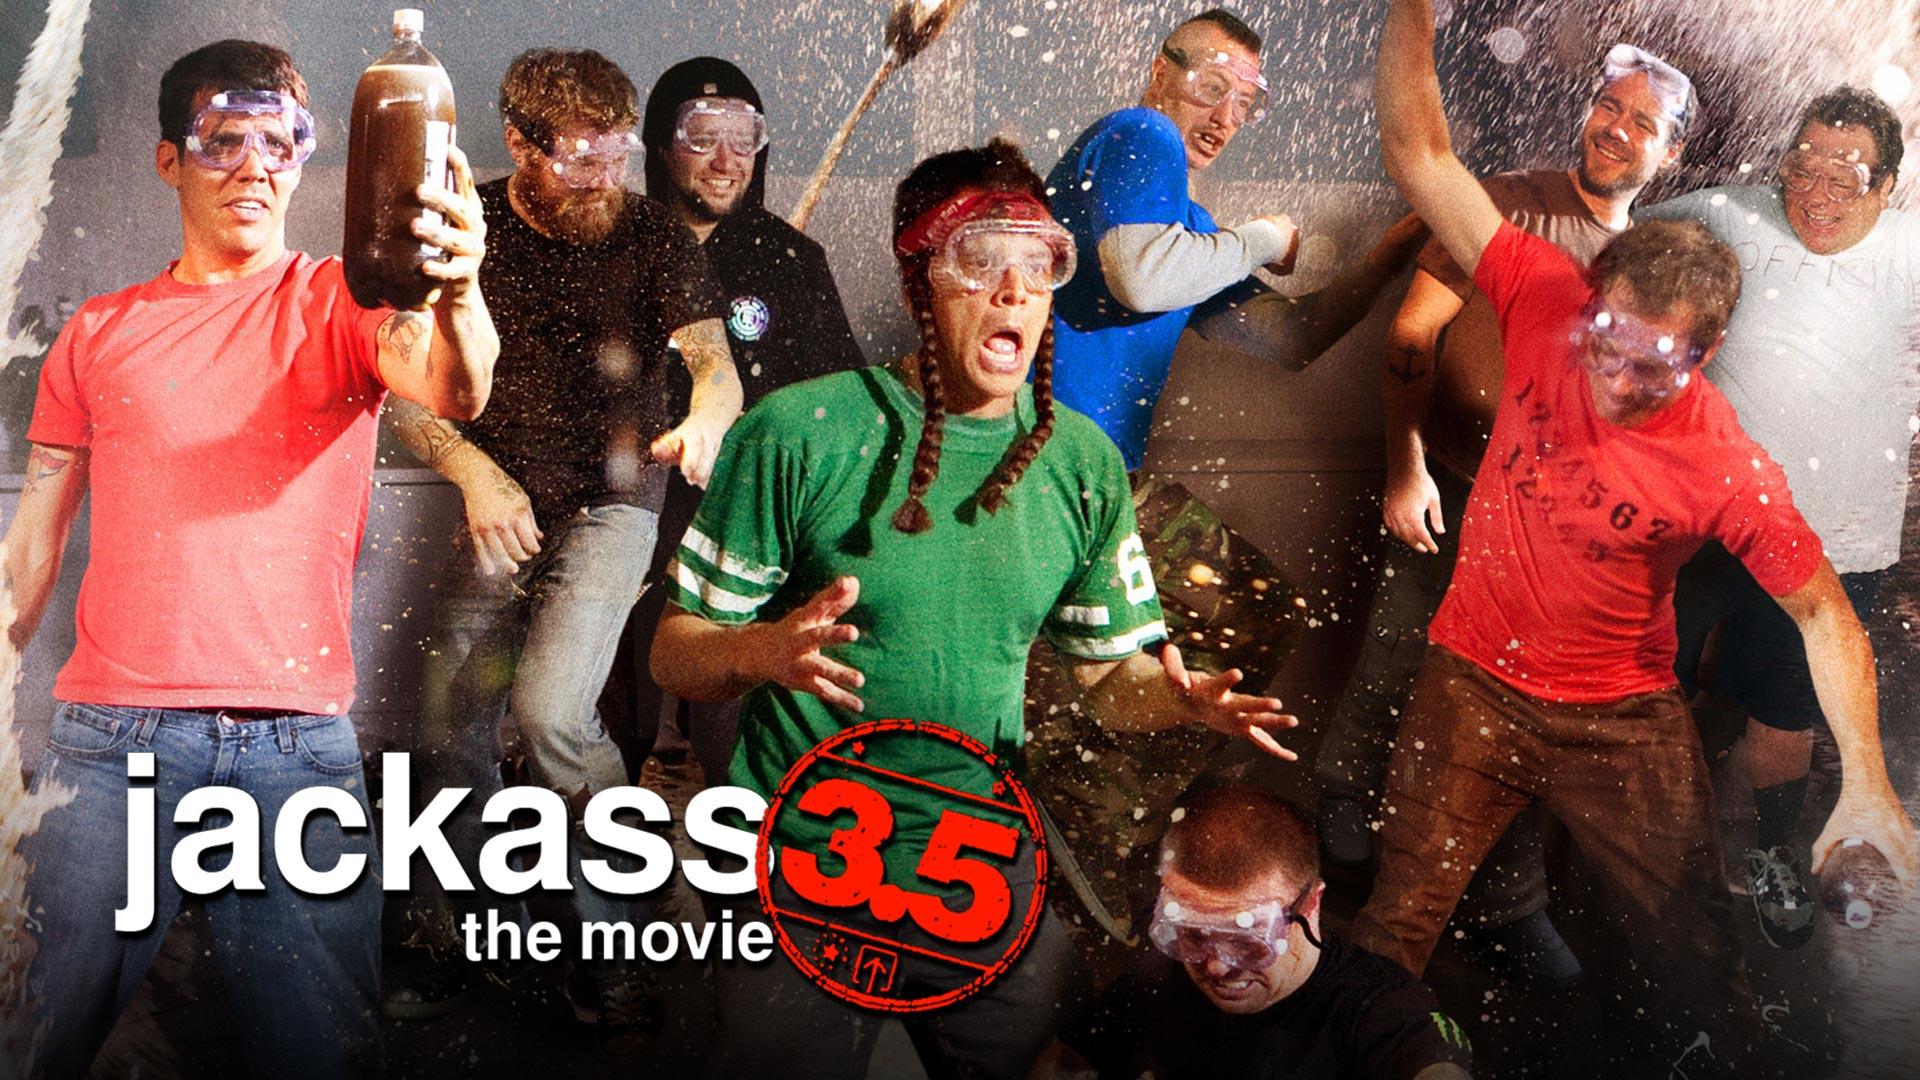 Jackass 3.5: The Movie